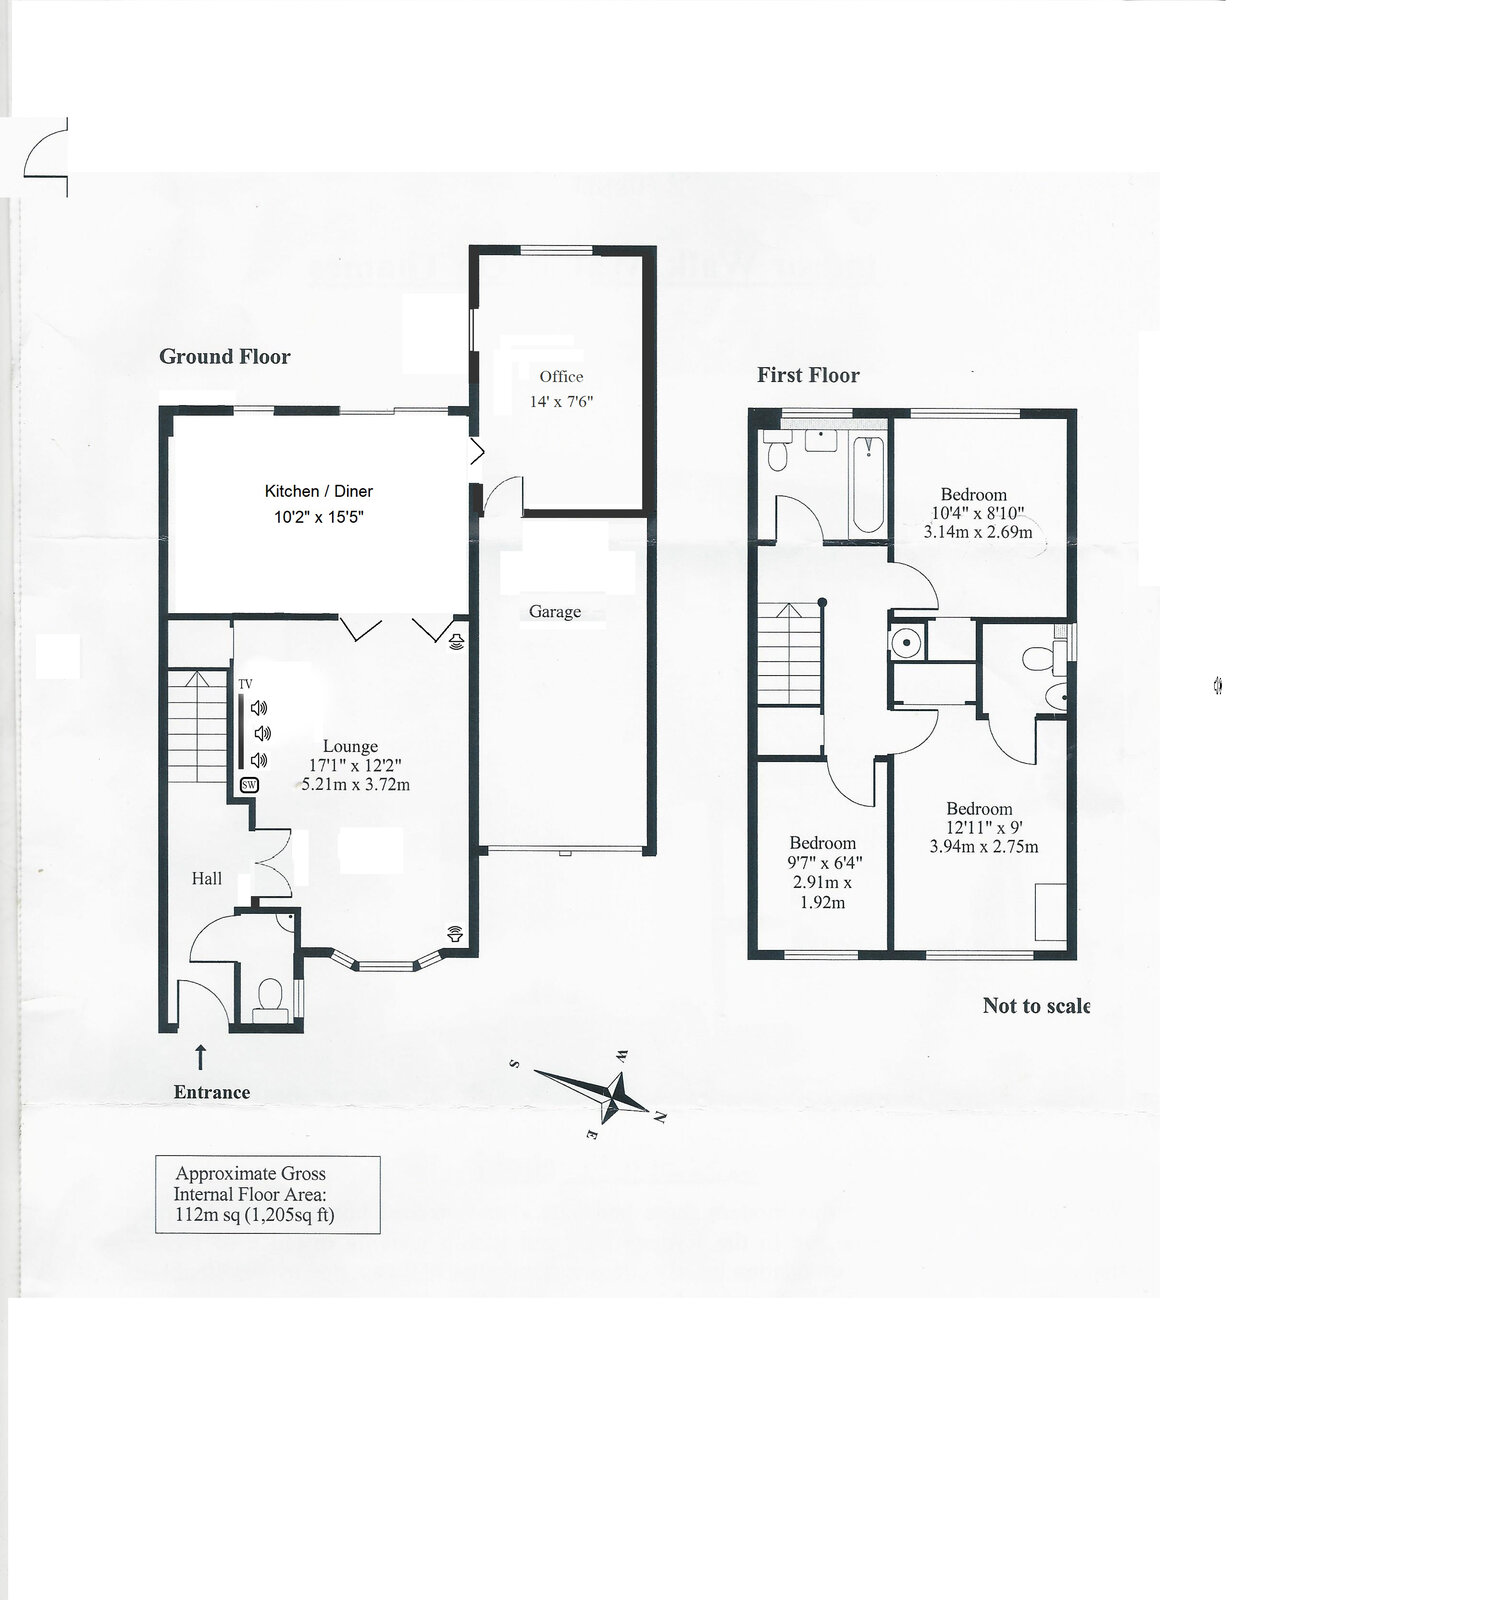 house plan 2 windsor walk existing HT.jpg